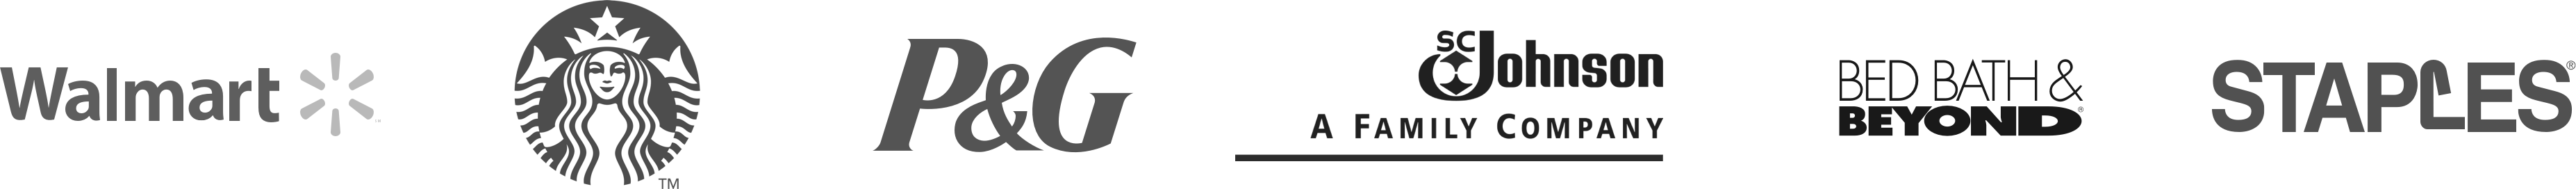 logos-brands